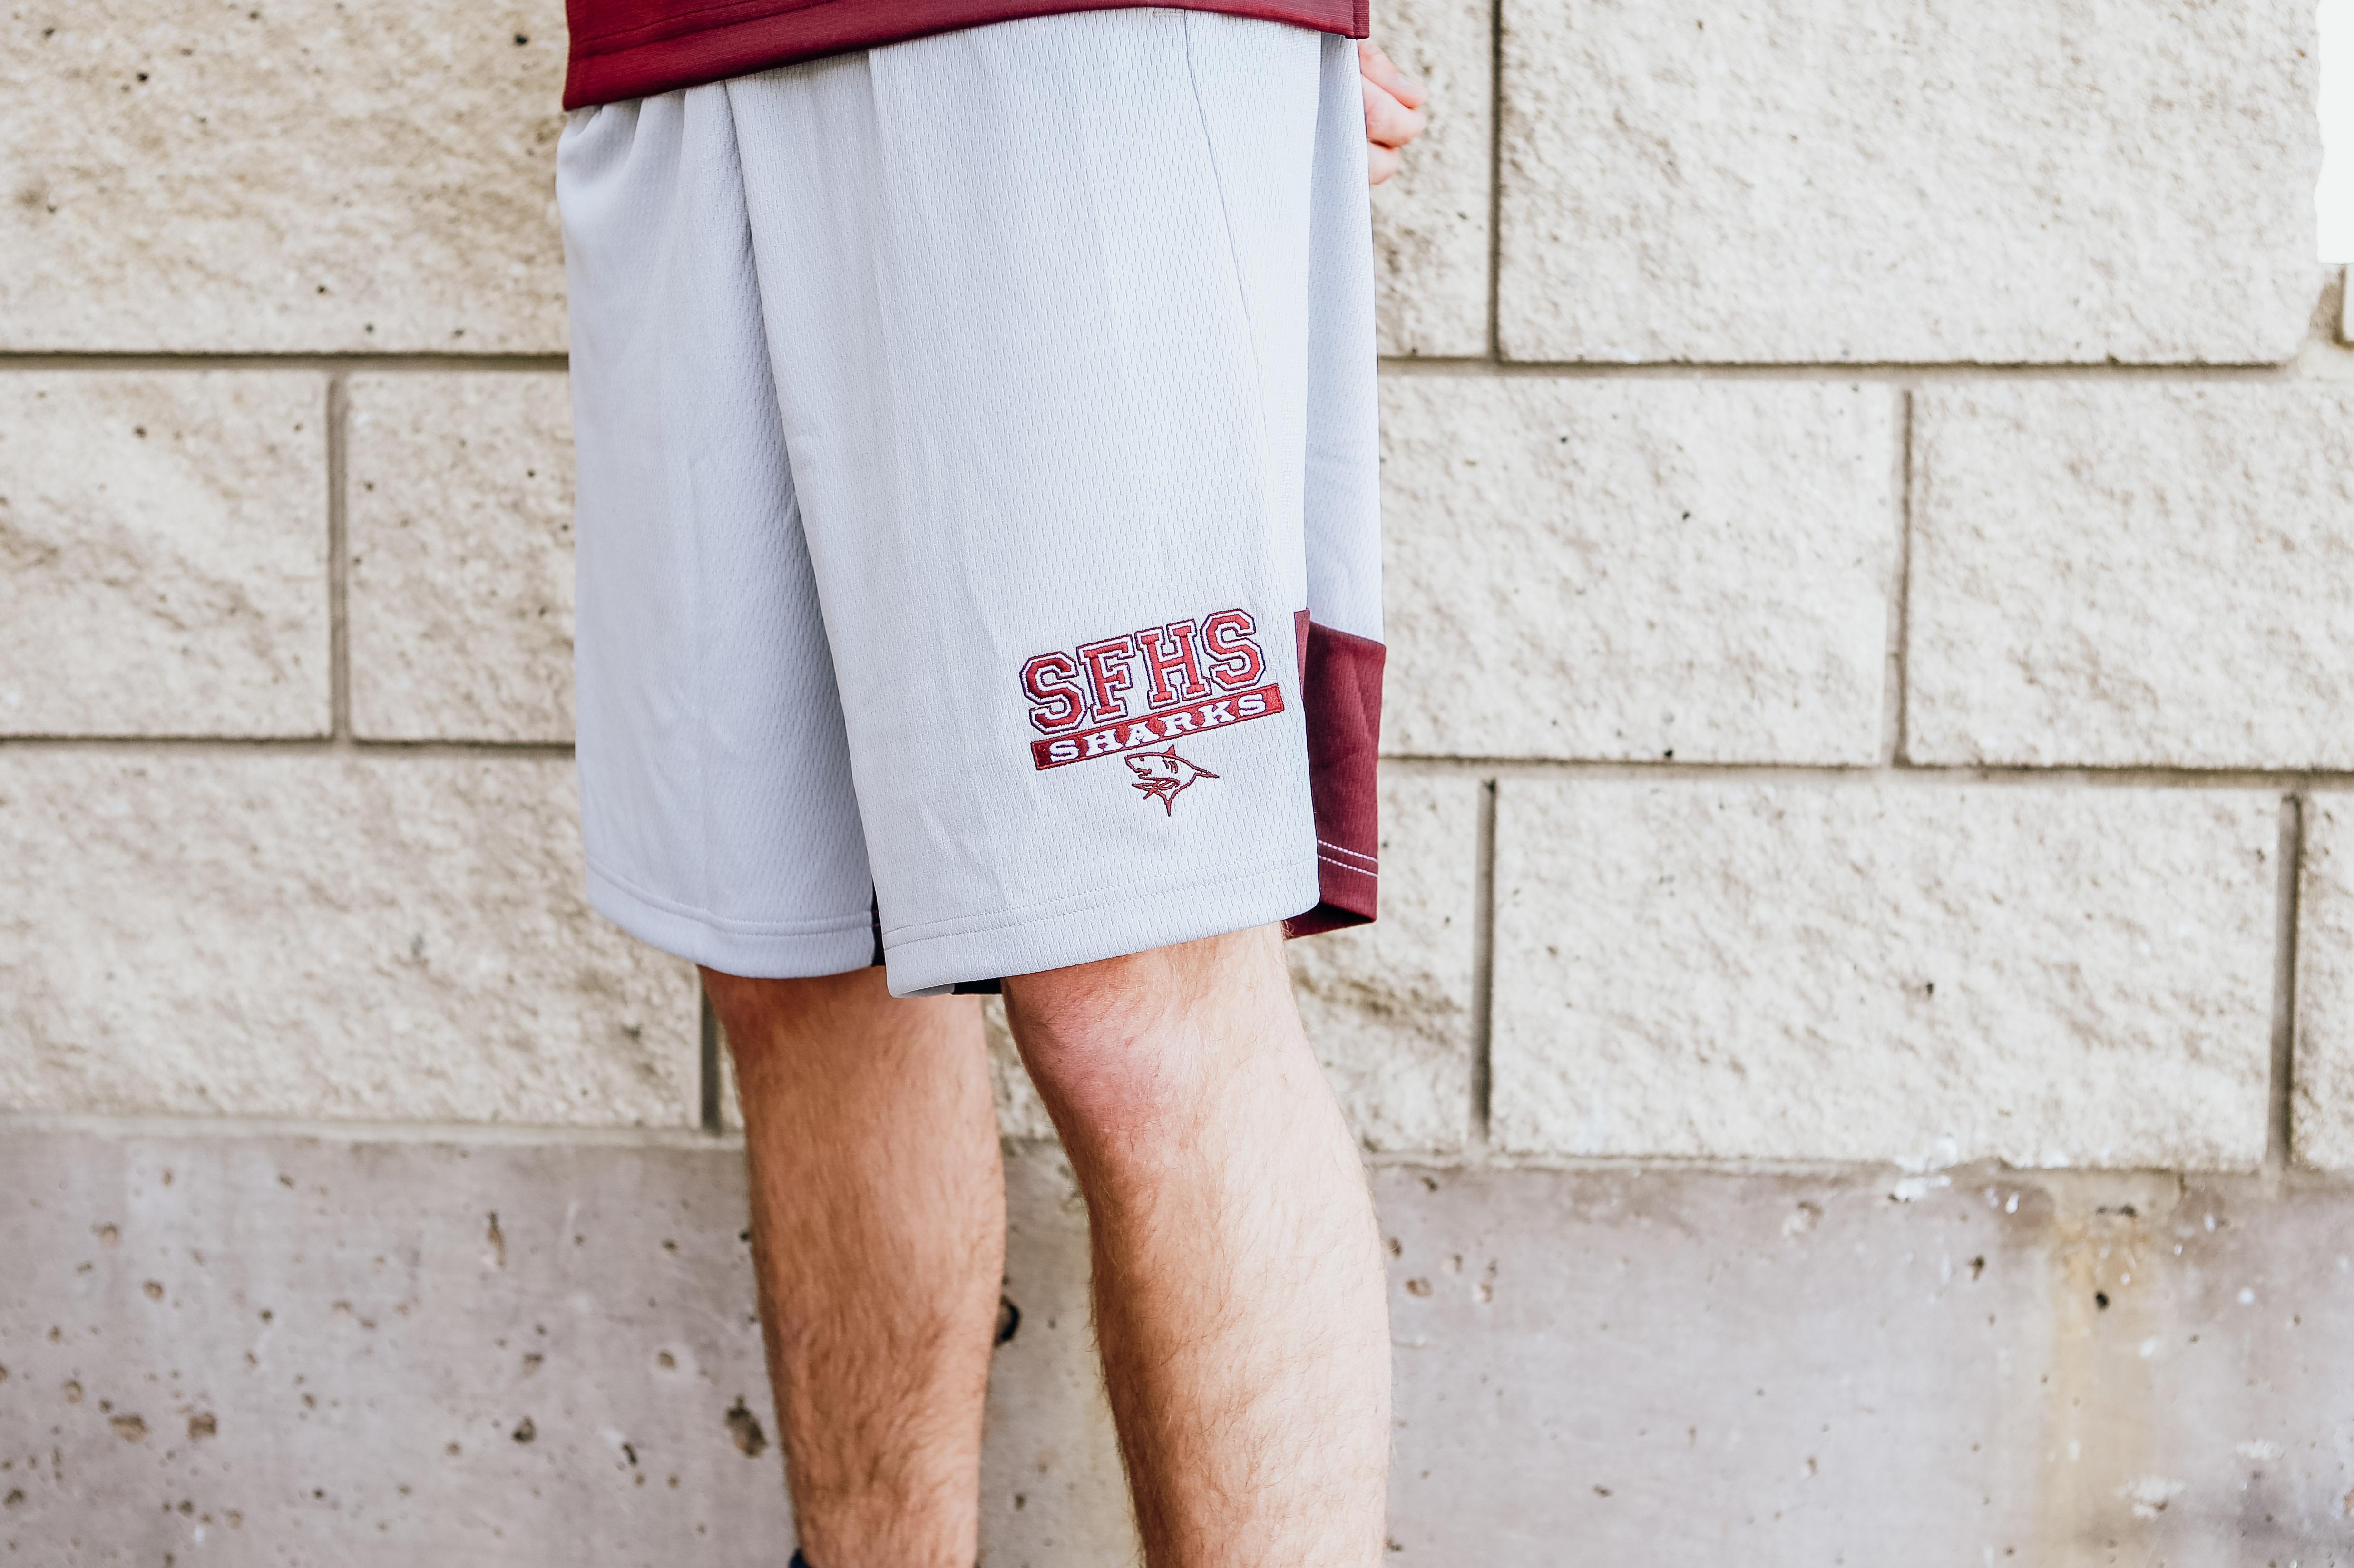 Breathe Knit Grey & Mar Shorts #4491.jpg